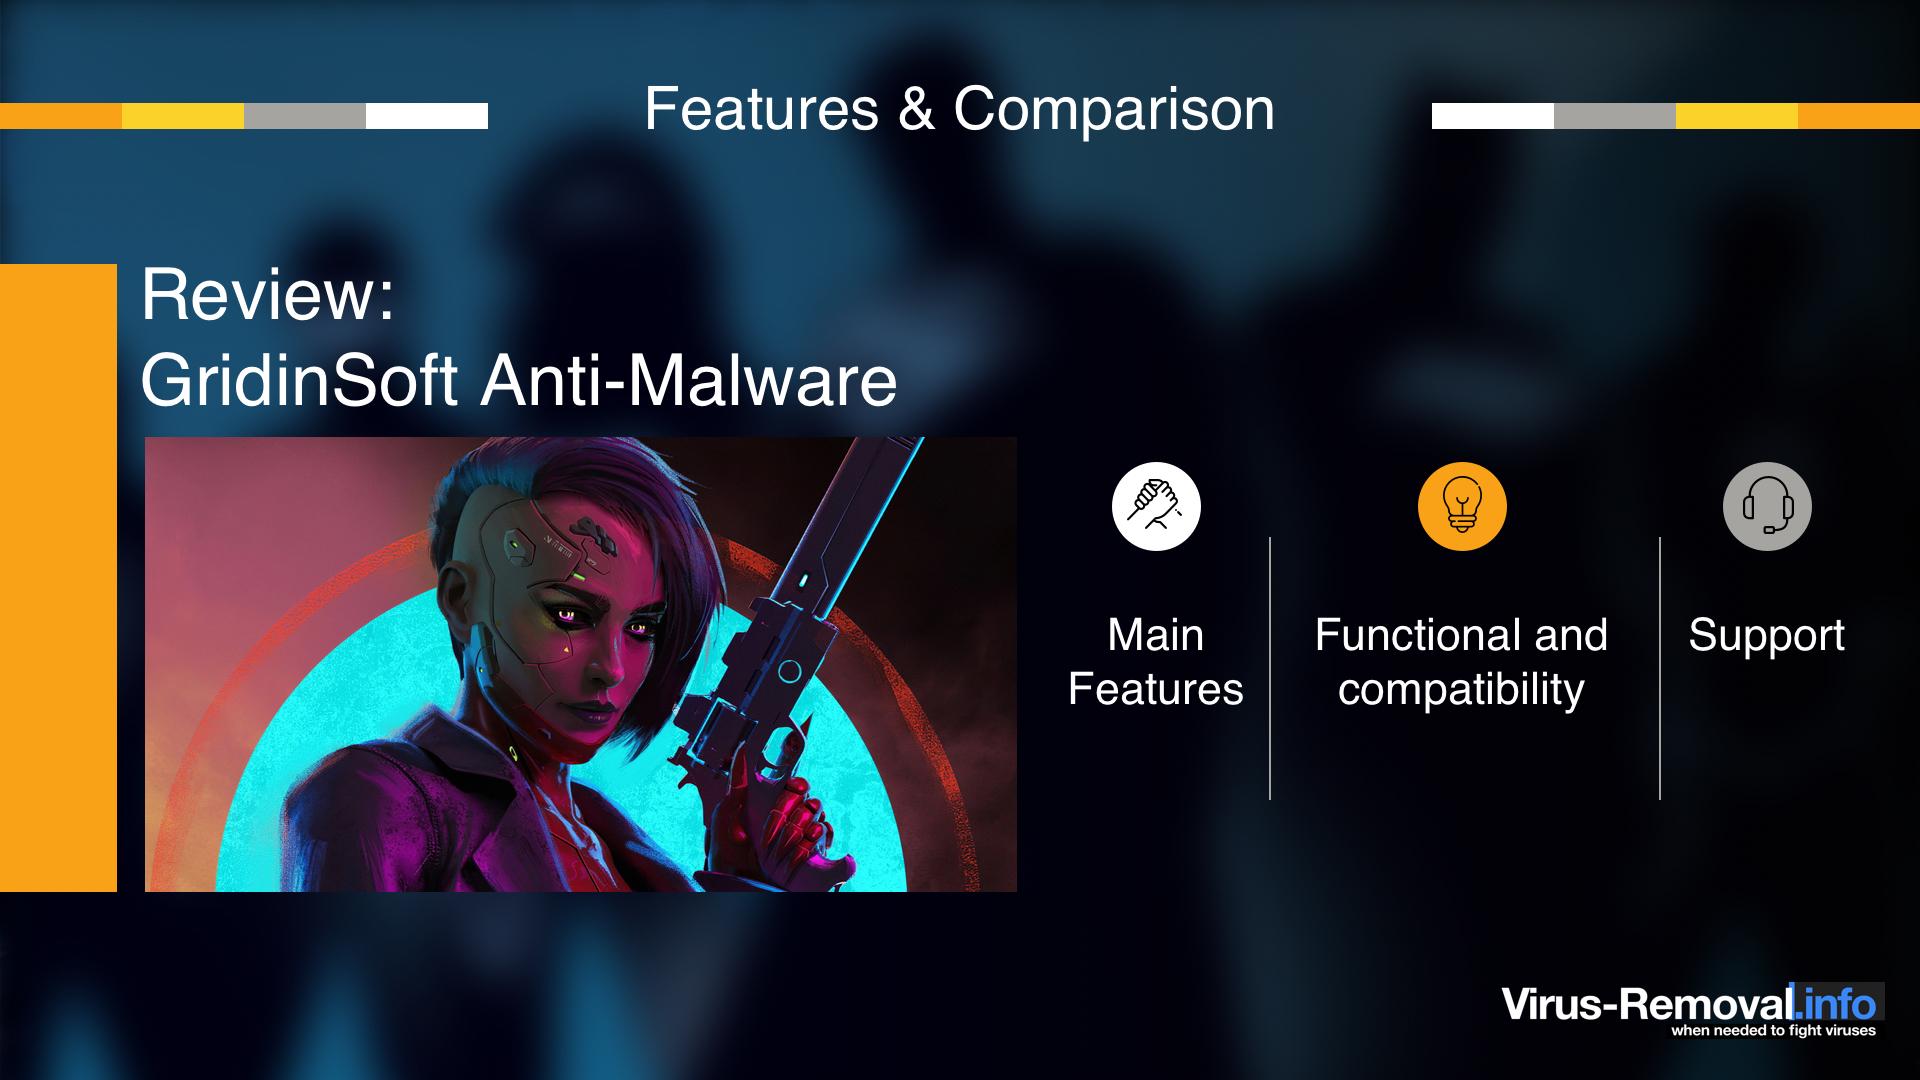 GridinSoft Anti-Malware Review